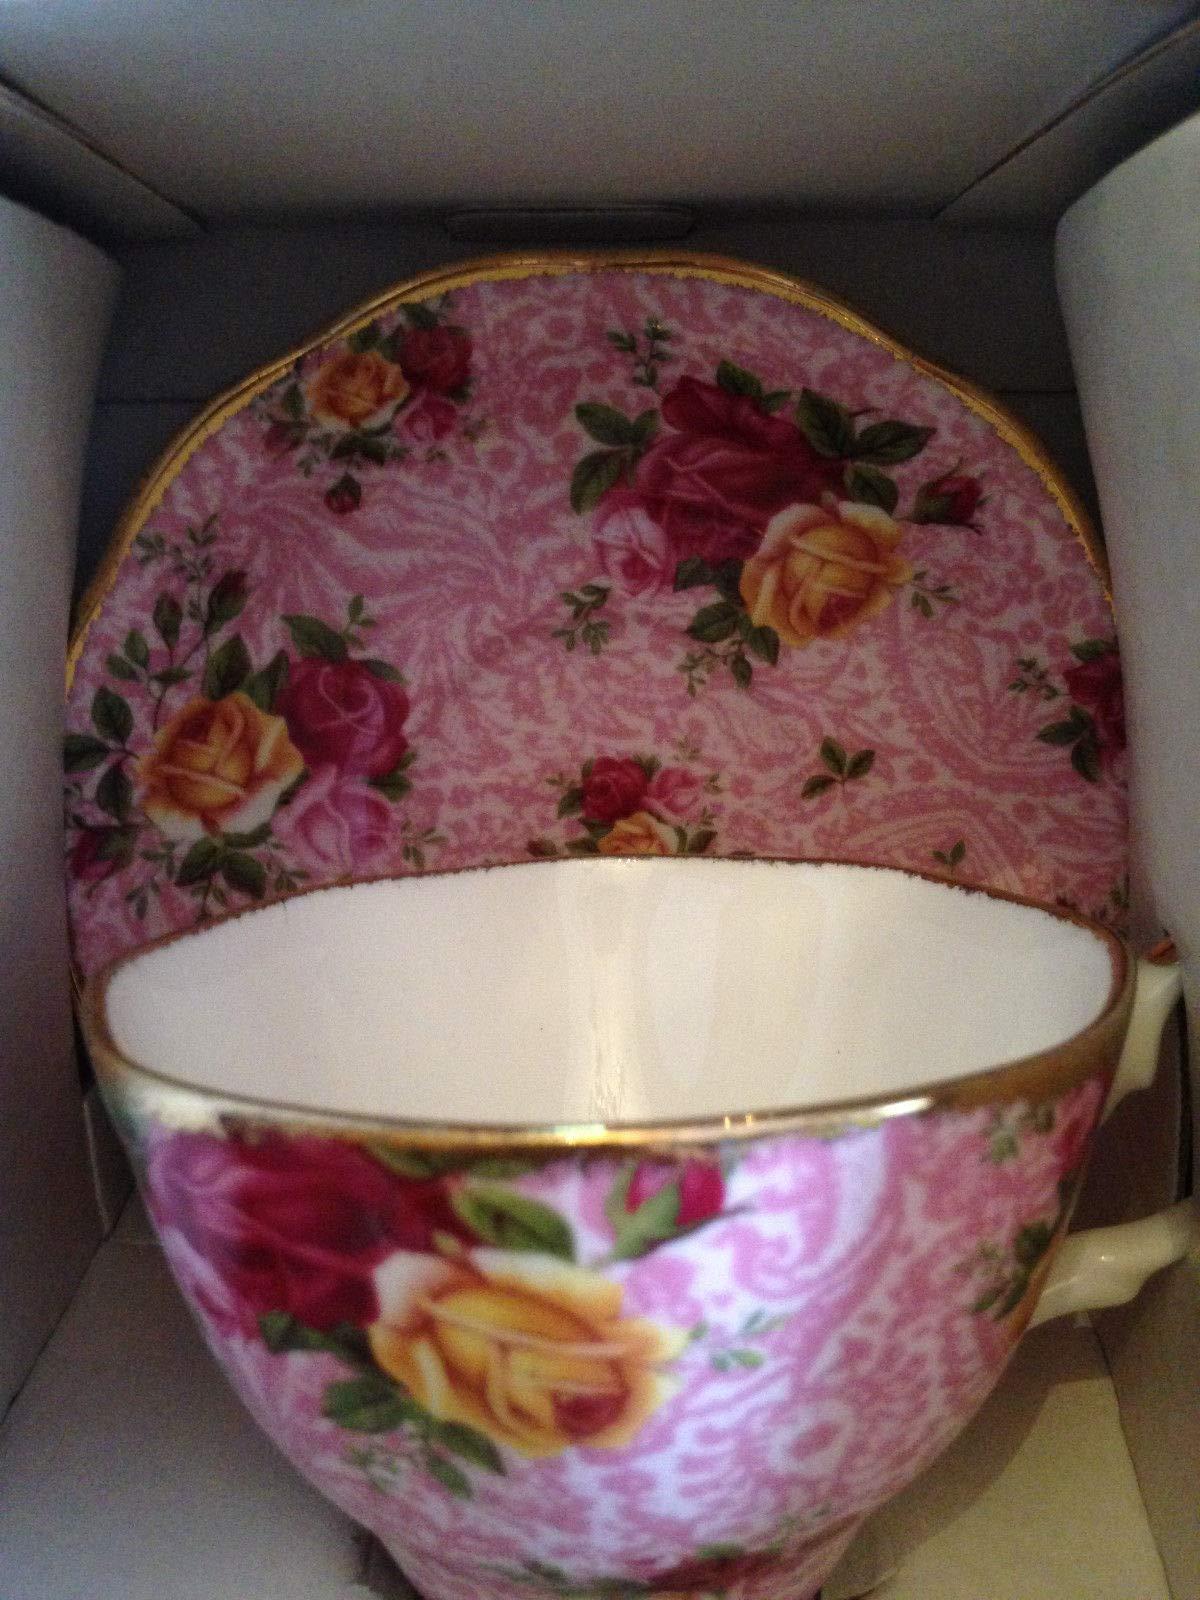 Tuweep Royal Albert English Bone China Cup Saucer Dusky Pink Lace New in Box!